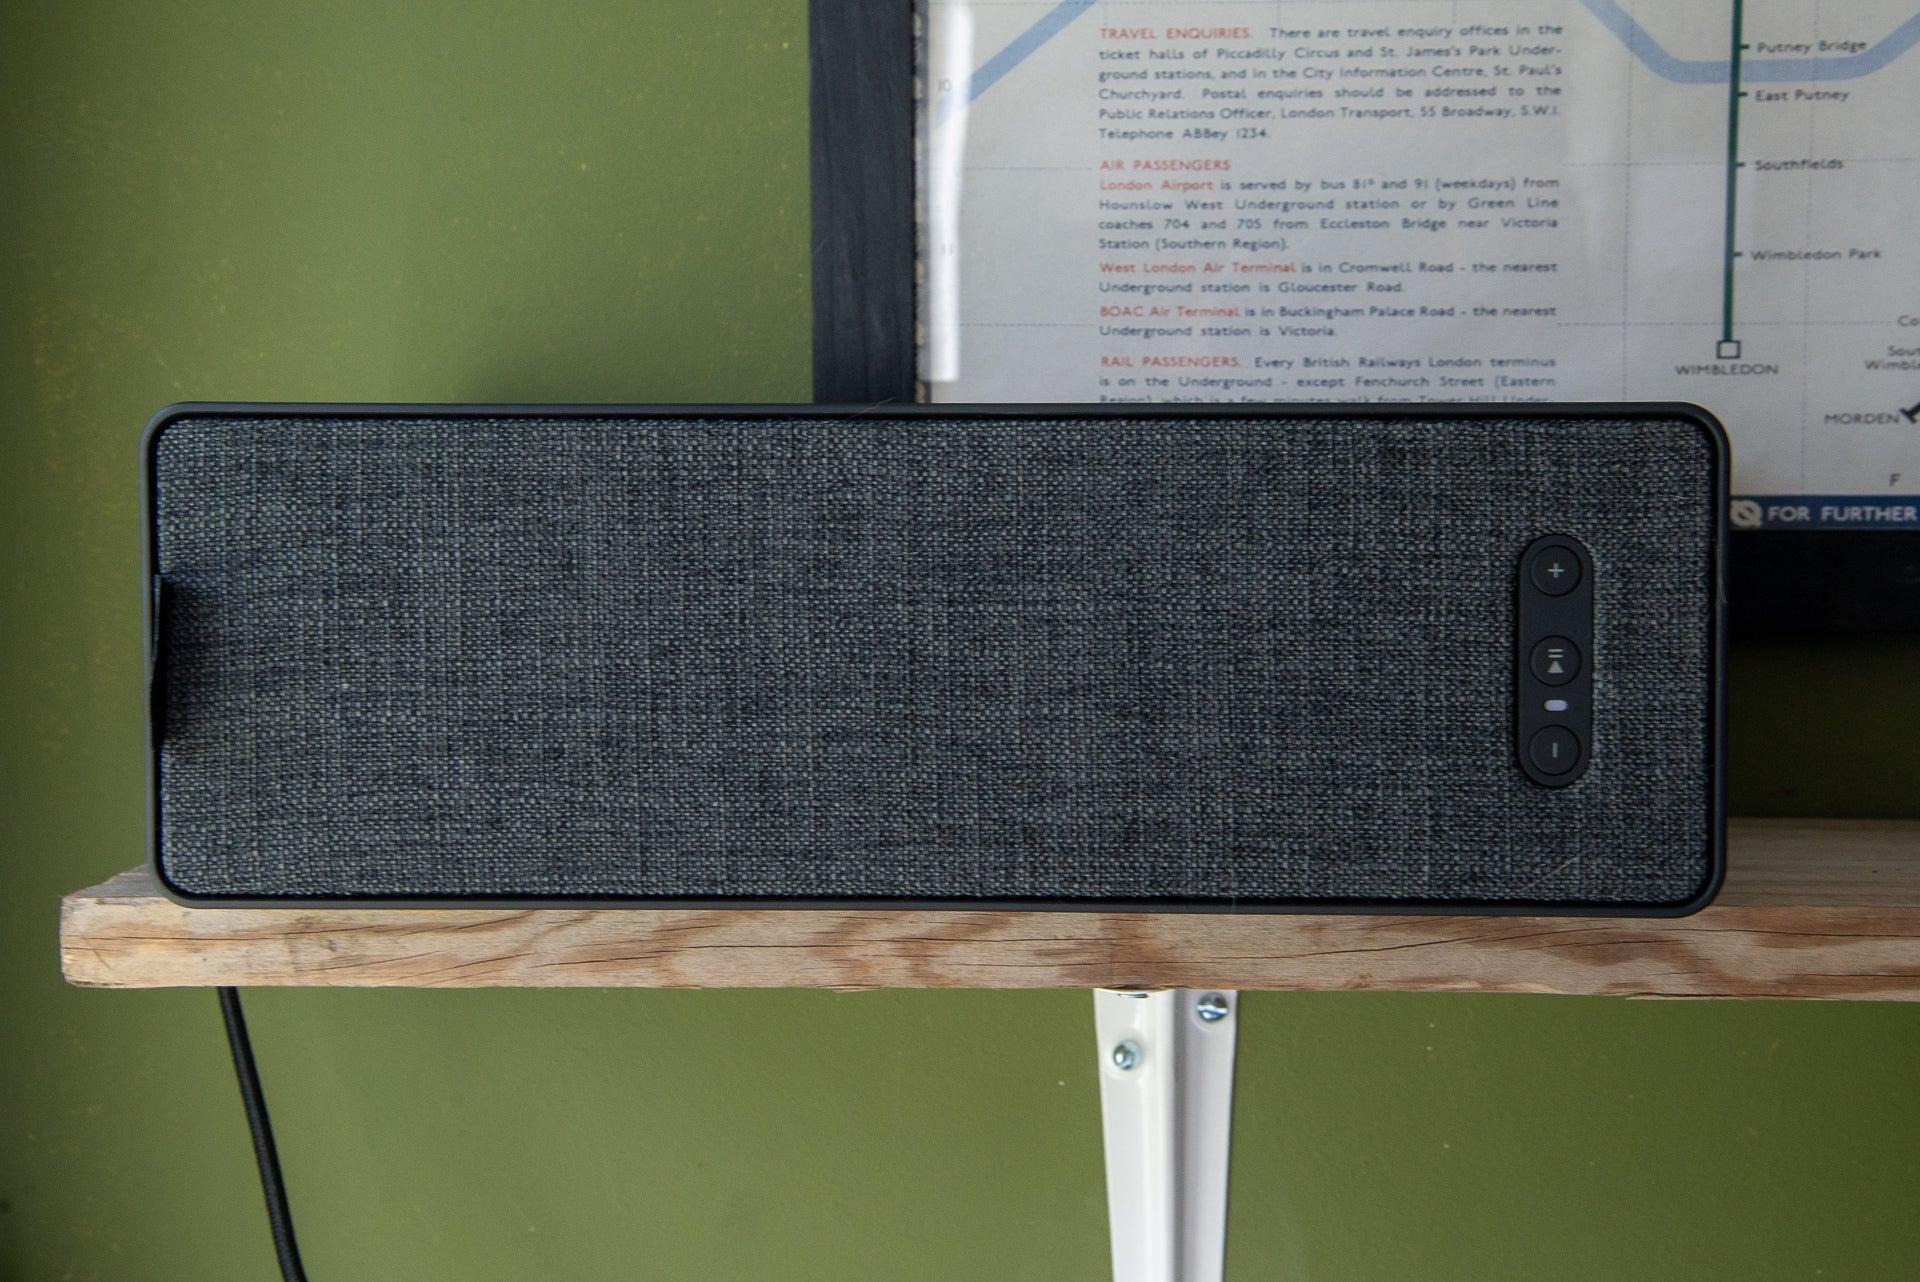 Ikea Symfonisk Bookshelf Speaker Flat